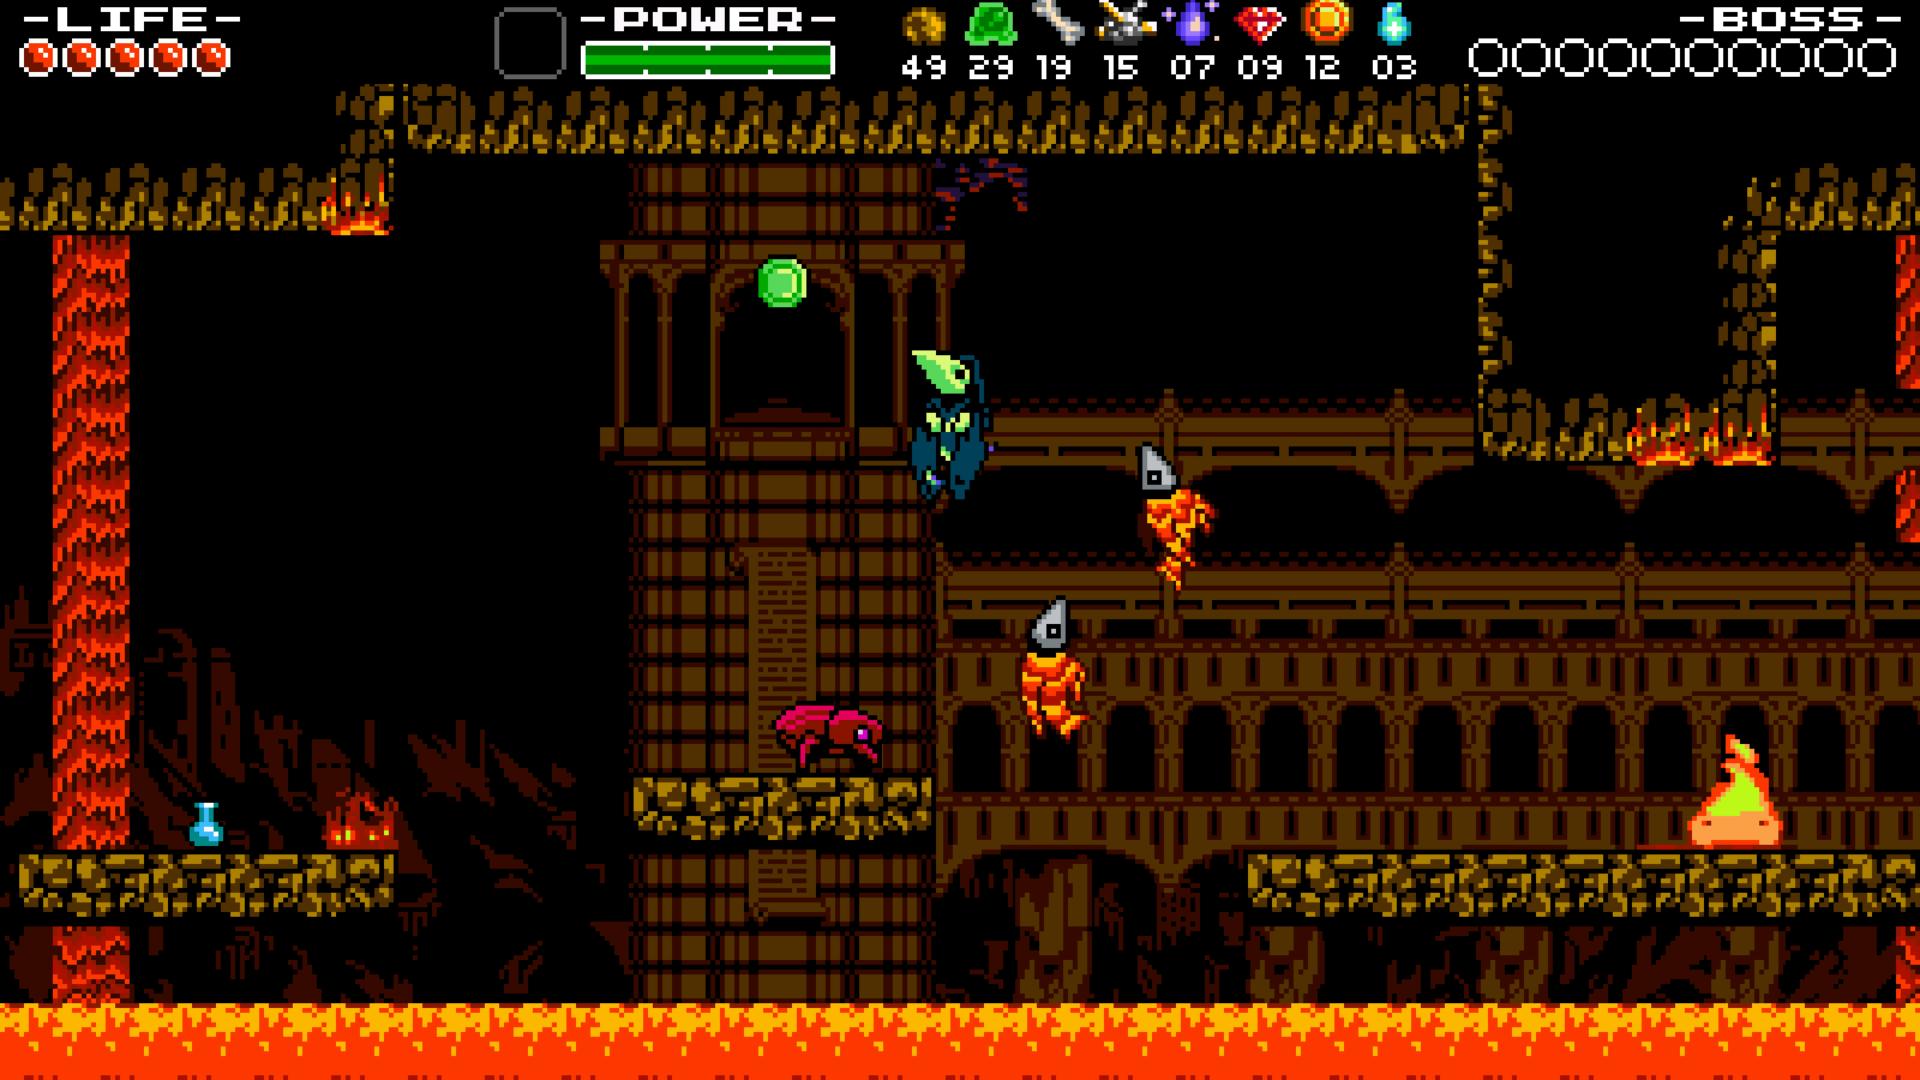 shovel_knight_plague_of_shadows_expanion_screenshot3